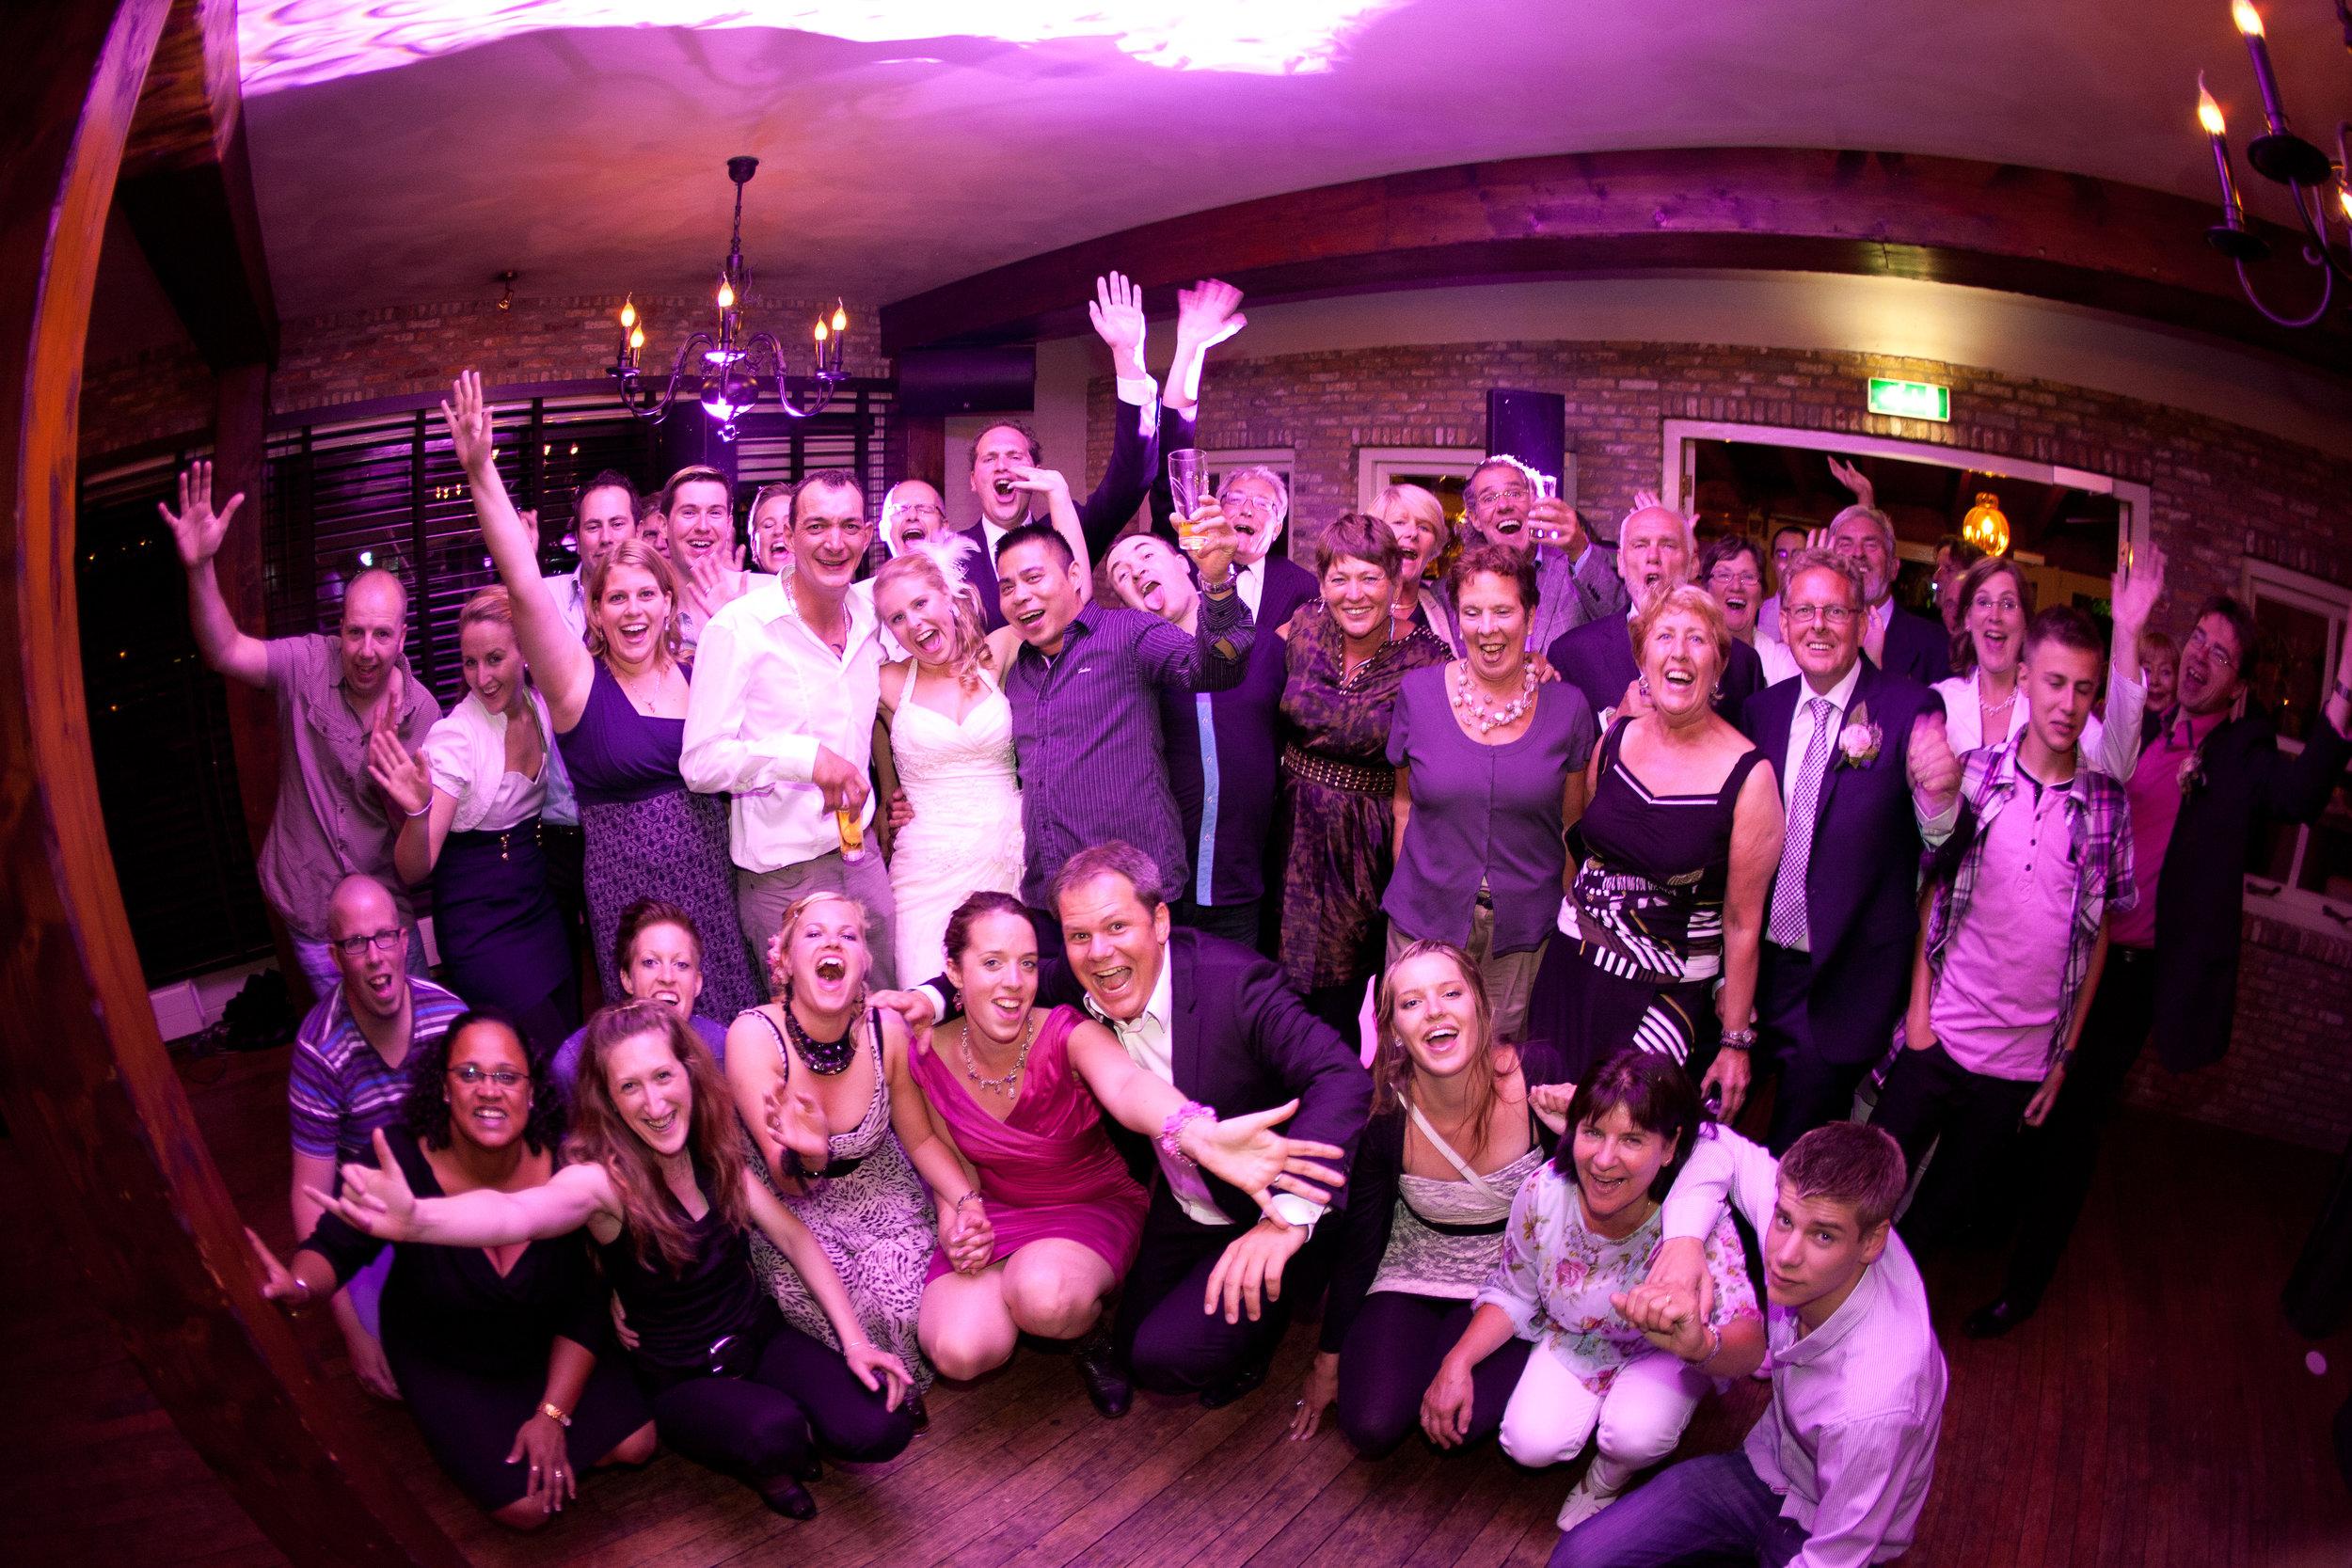 trouwshoot-bruidsfotografie-trouwfoto-feestfotografie-trouwreportage-Laurens en Bettiana576.jpg